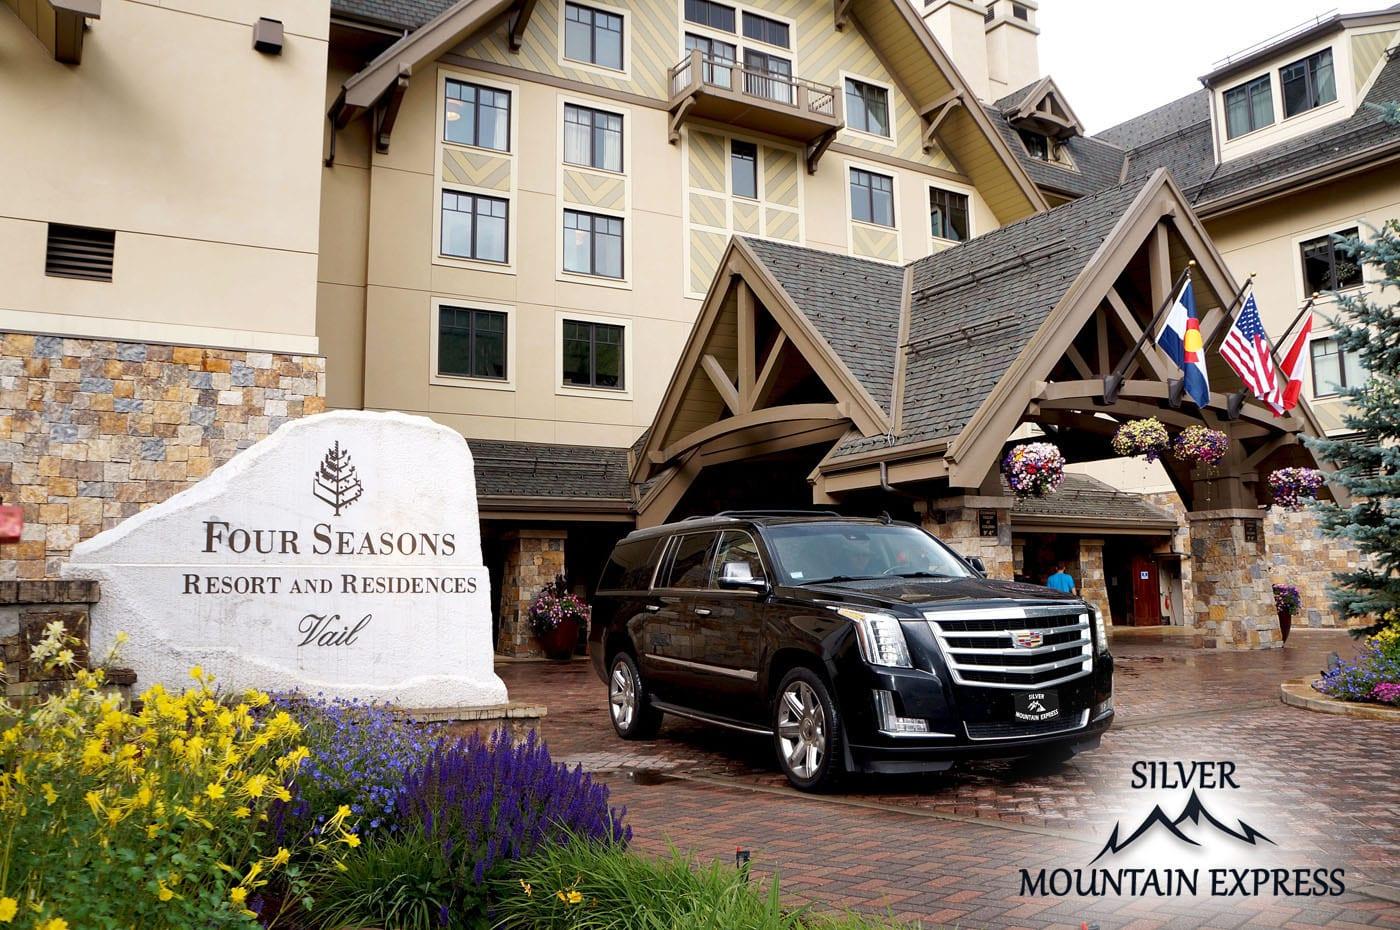 Silver Mountain Express Vail Four Seasons Resort